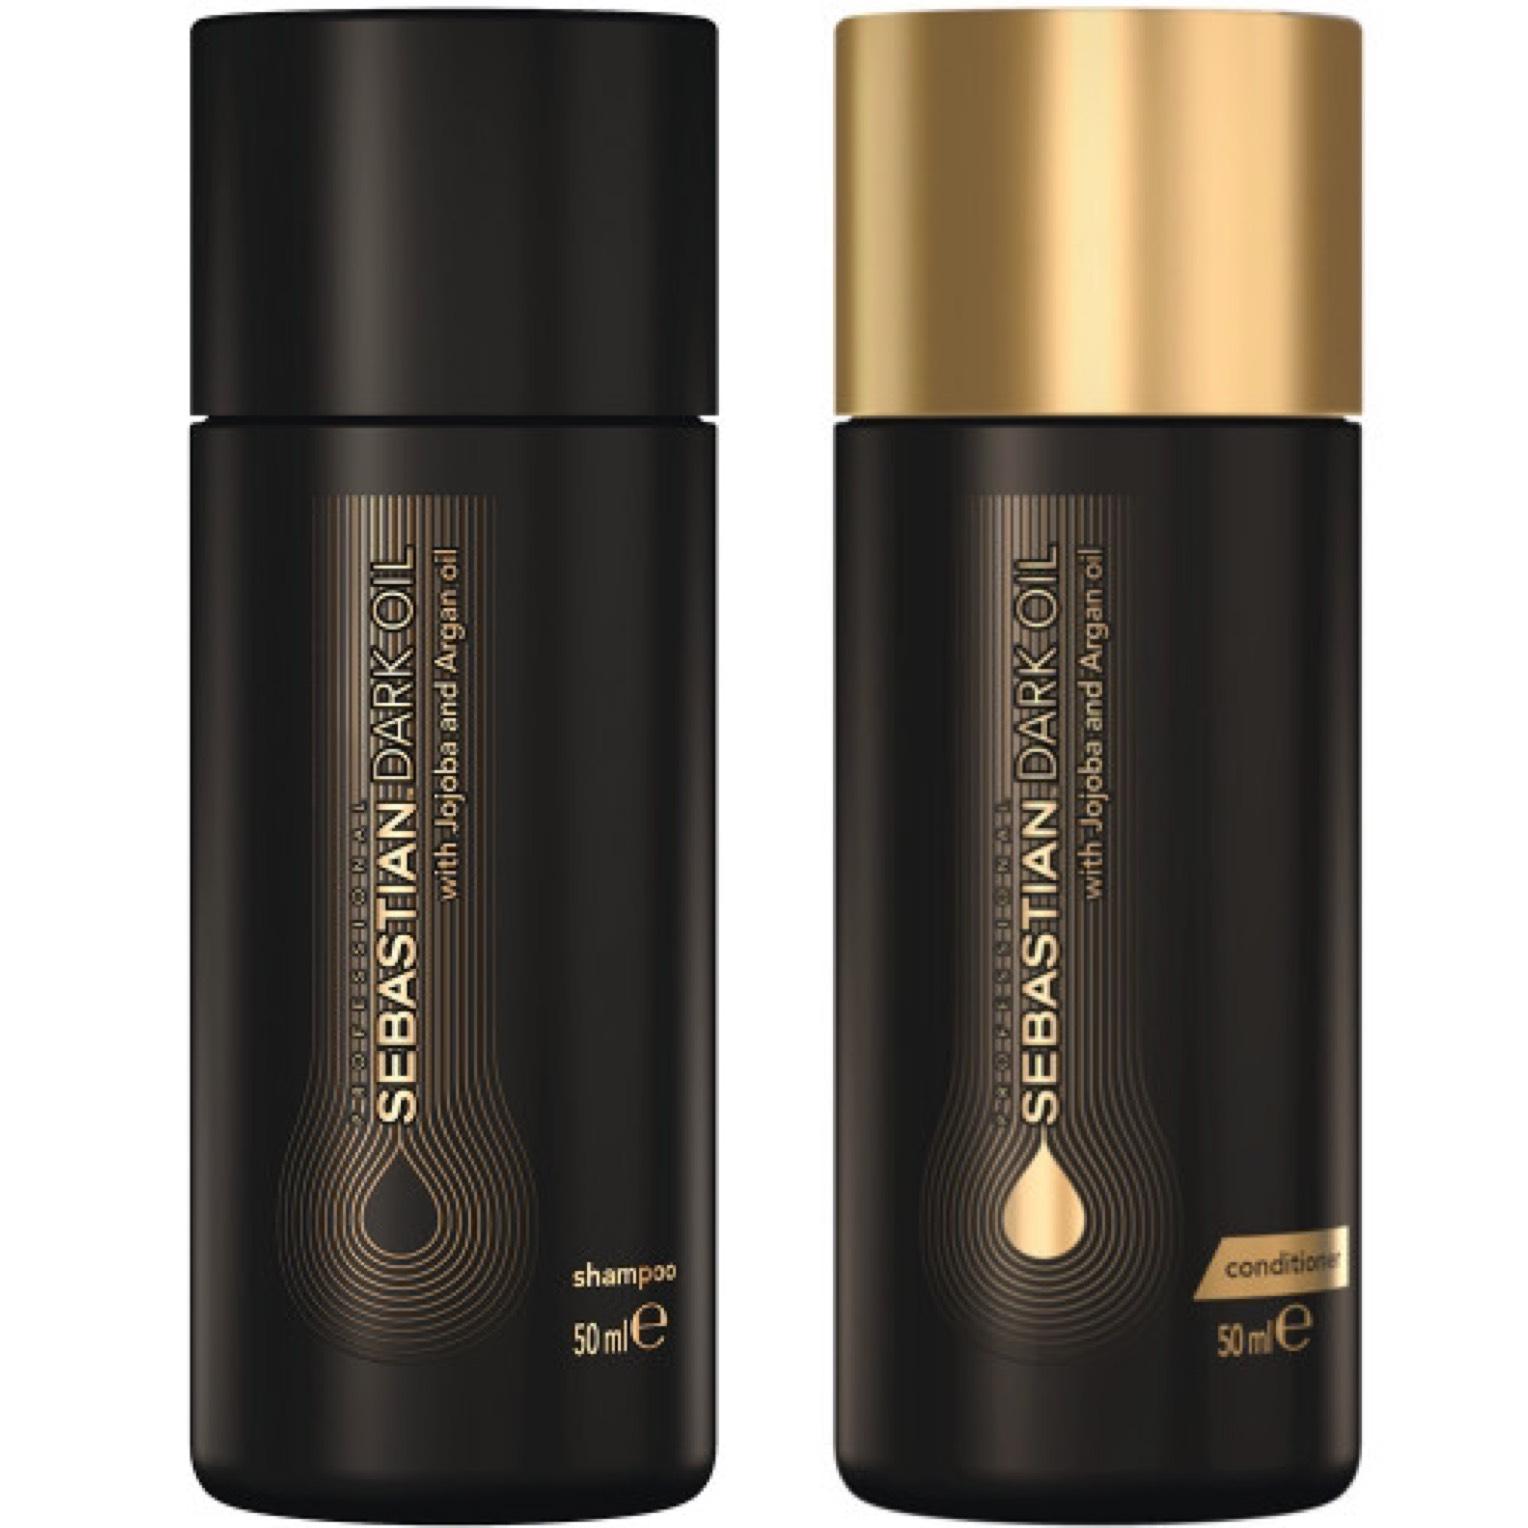 Sebastian Dark Oil - Shampoo 50ml + Conditioner 50ml